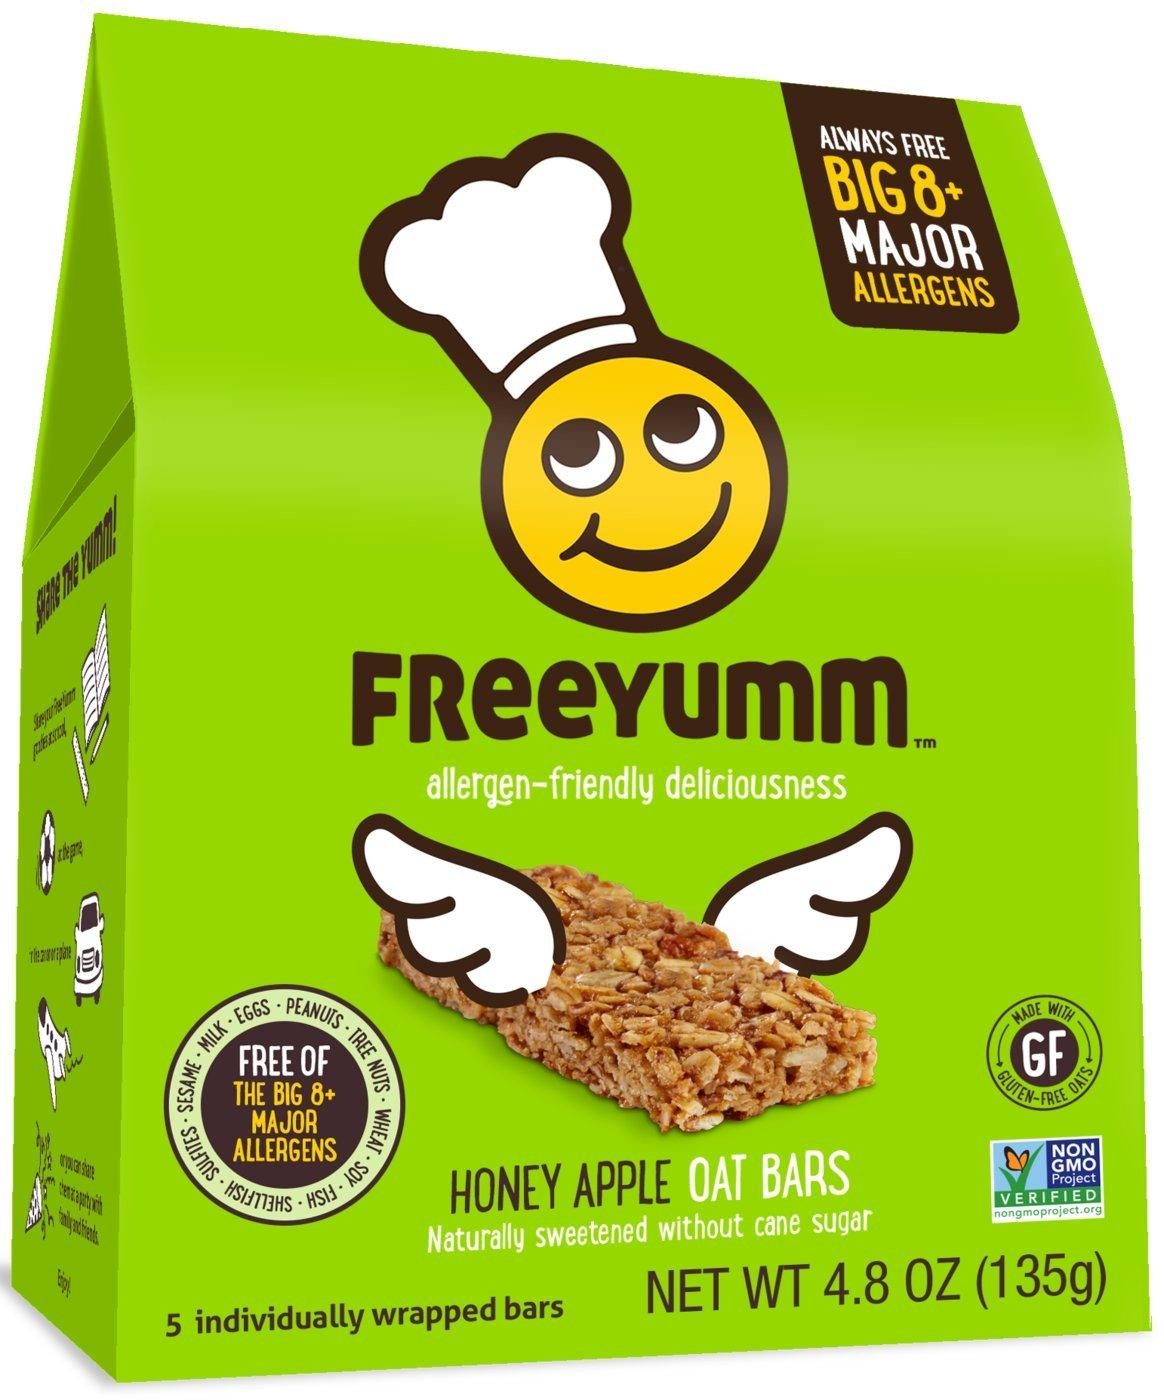 Allergen Free Honey Apple Oat Bars, School Safe Allergy Friendly Snack Food for Kids, Total of 15 Bars